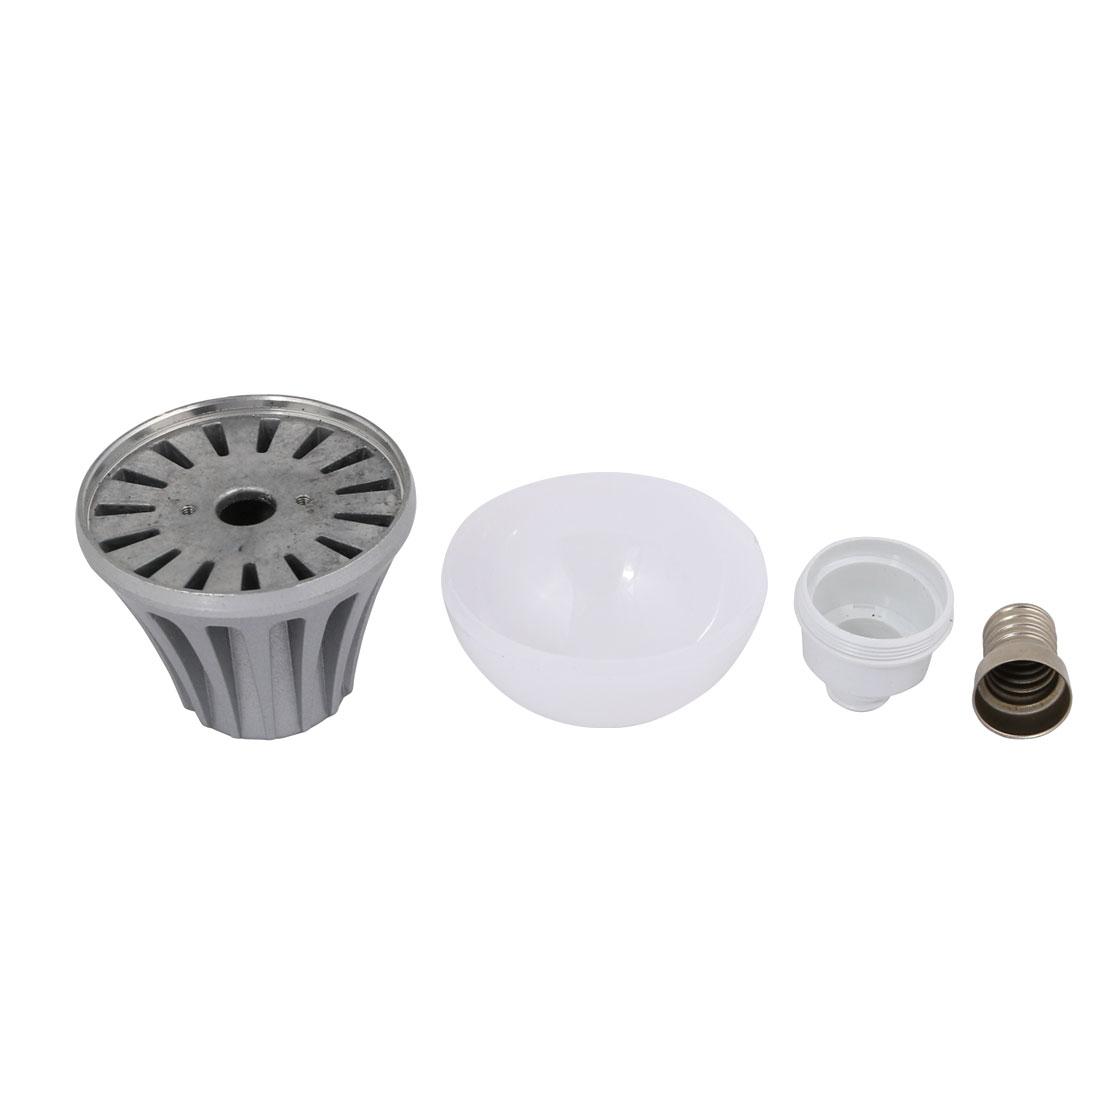 2Pcs 5W/7W Sliver Tone Aluminum Ball - Bulb Lamp Housing E14 Base w White Cover - image 3 of 4